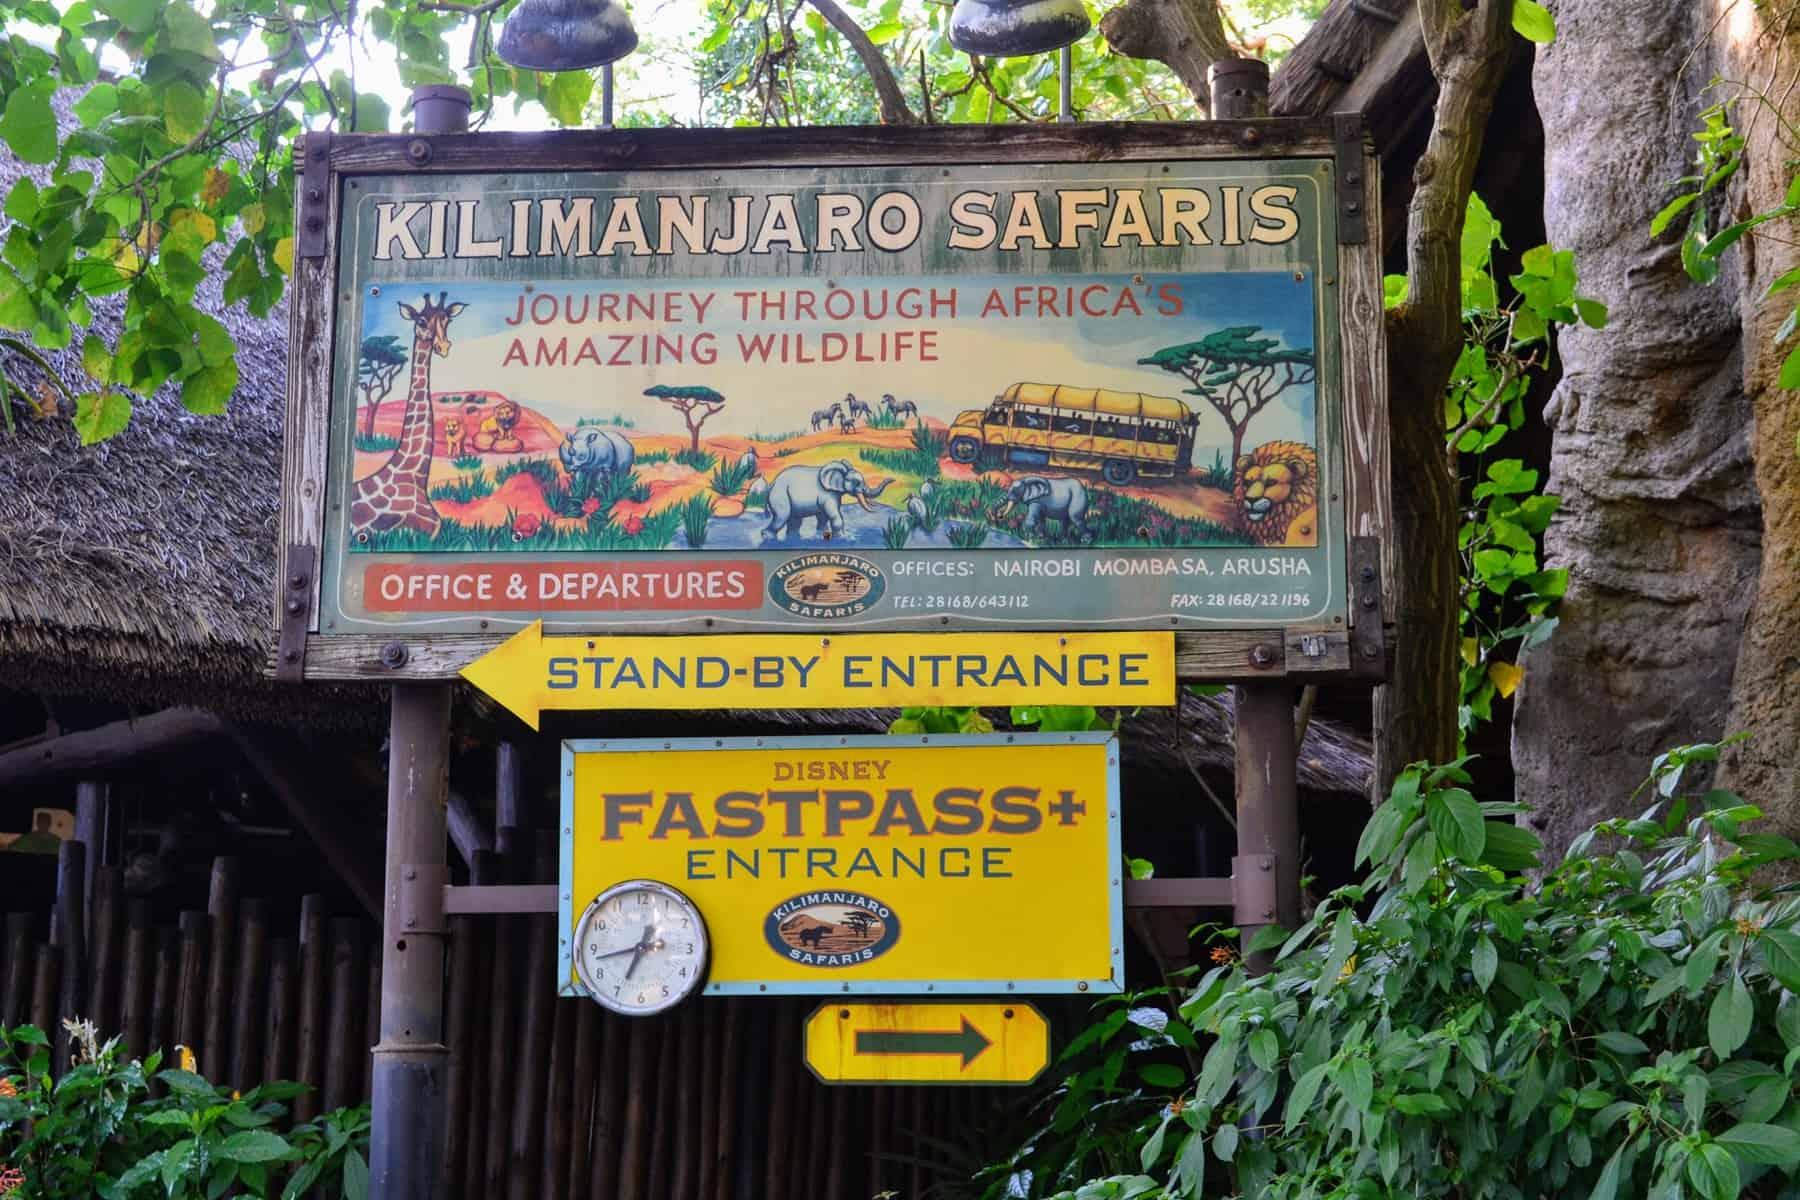 kilimanjaro safaris sign at animal kingdom